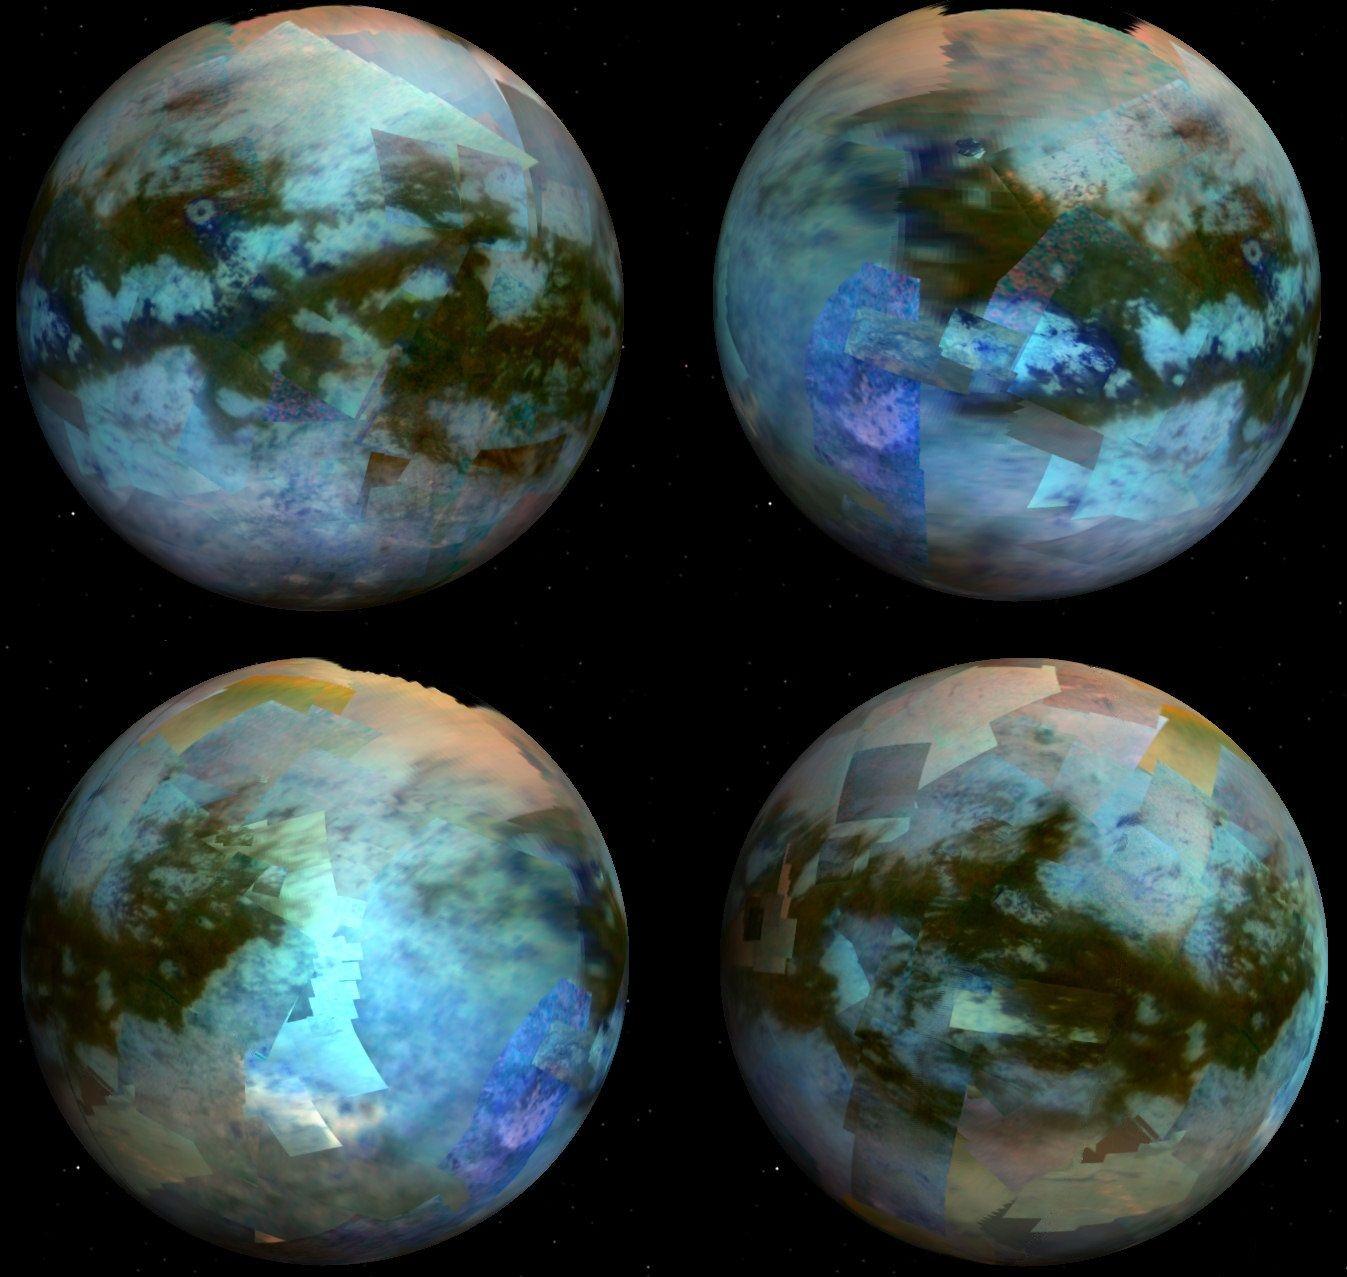 Титан планета картинки